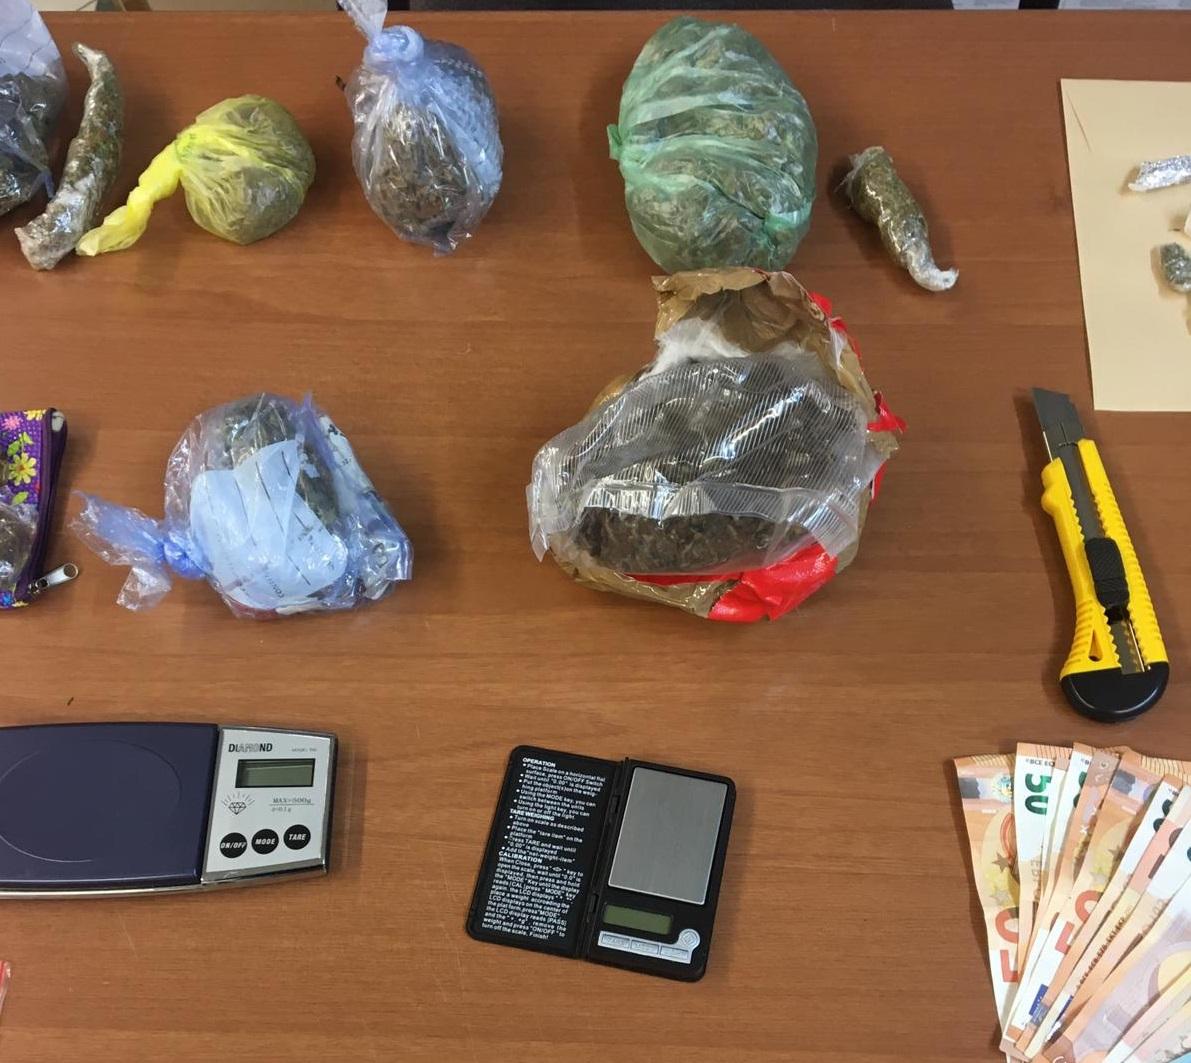 Marijuana e hashish in casa pronti per essere spacciati: arrestata rumena